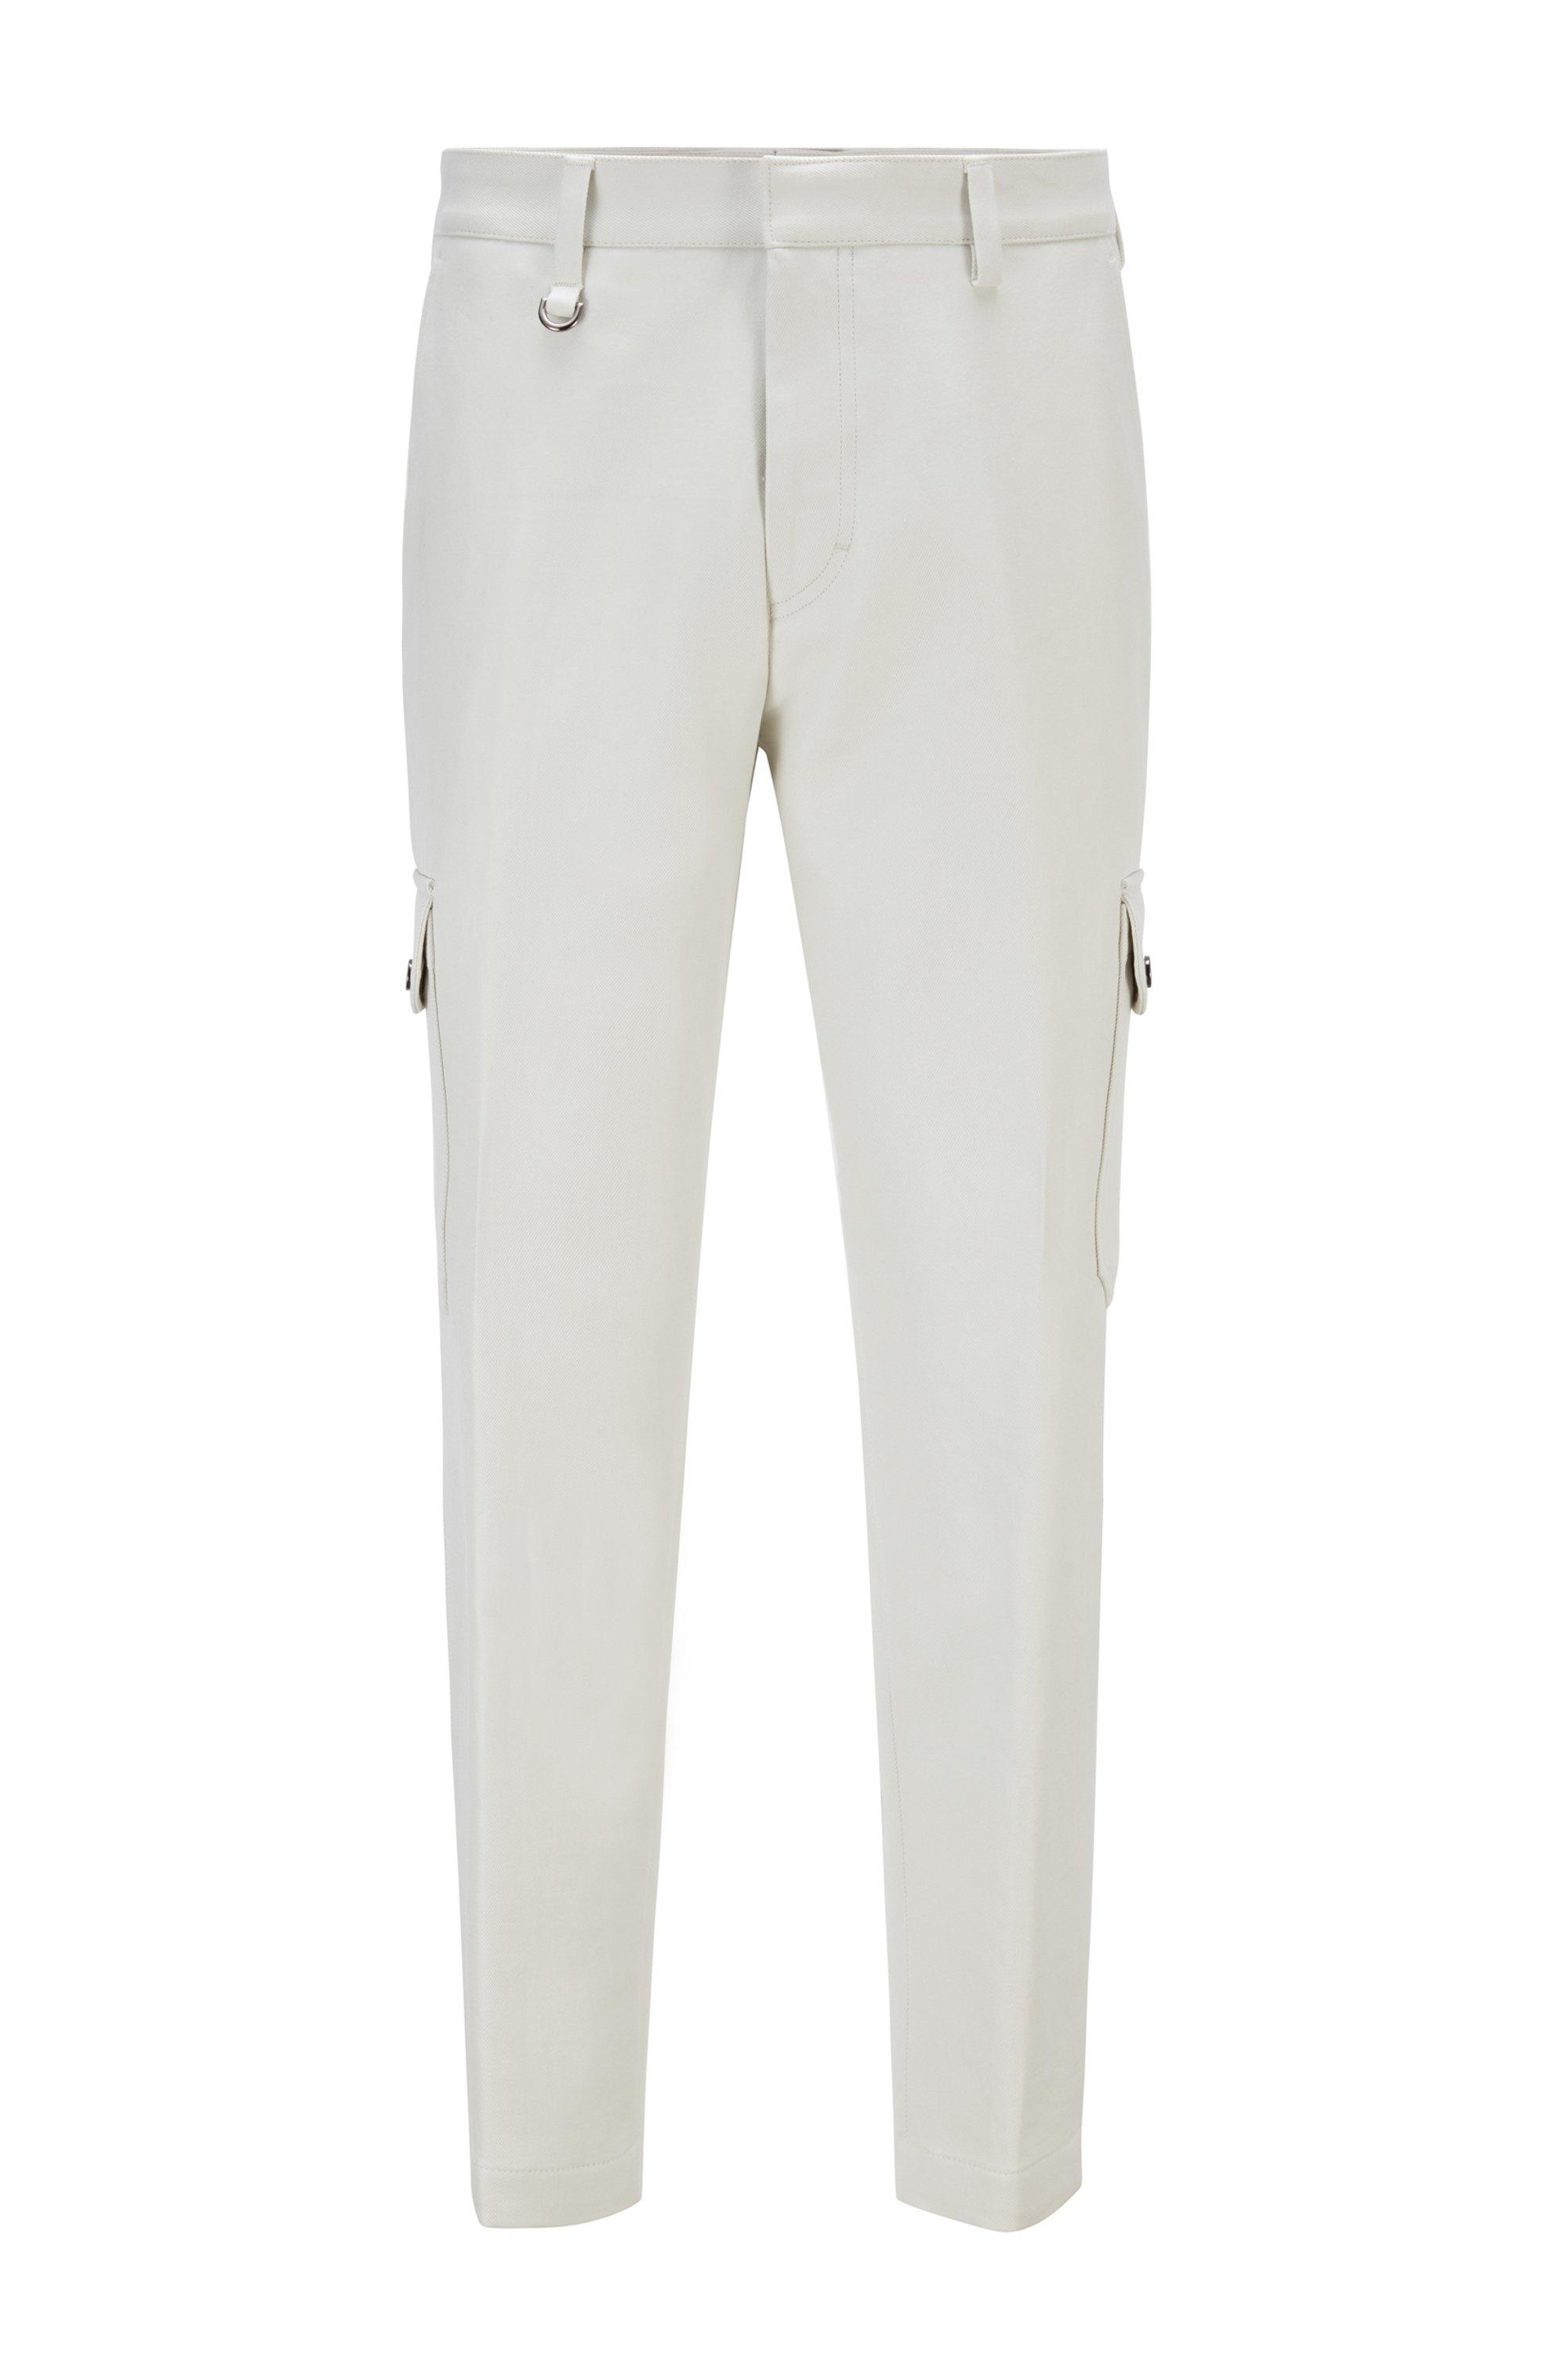 Pantalones cargo oversize fit en algodón con detalle de anilla semicircular, Blanco